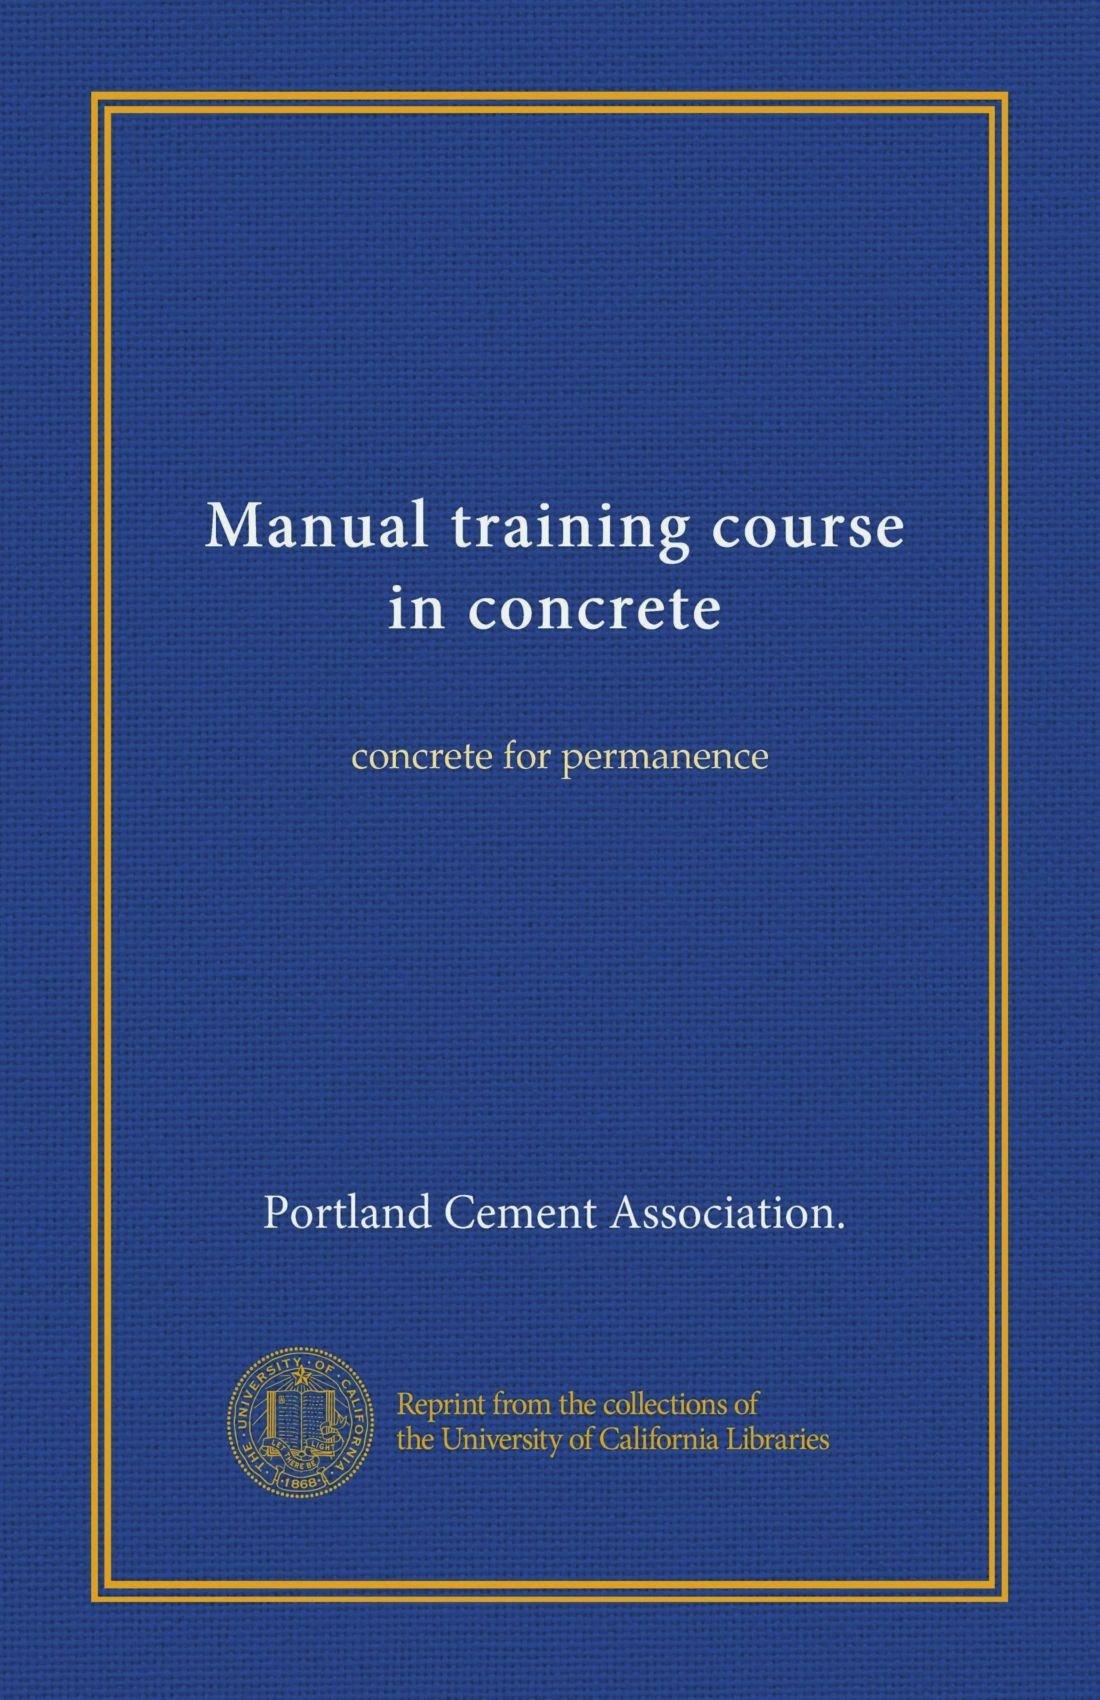 manual training course in concrete concrete for permanence rh amazon com Portland Cement Association PDF portland cement association manual pdf